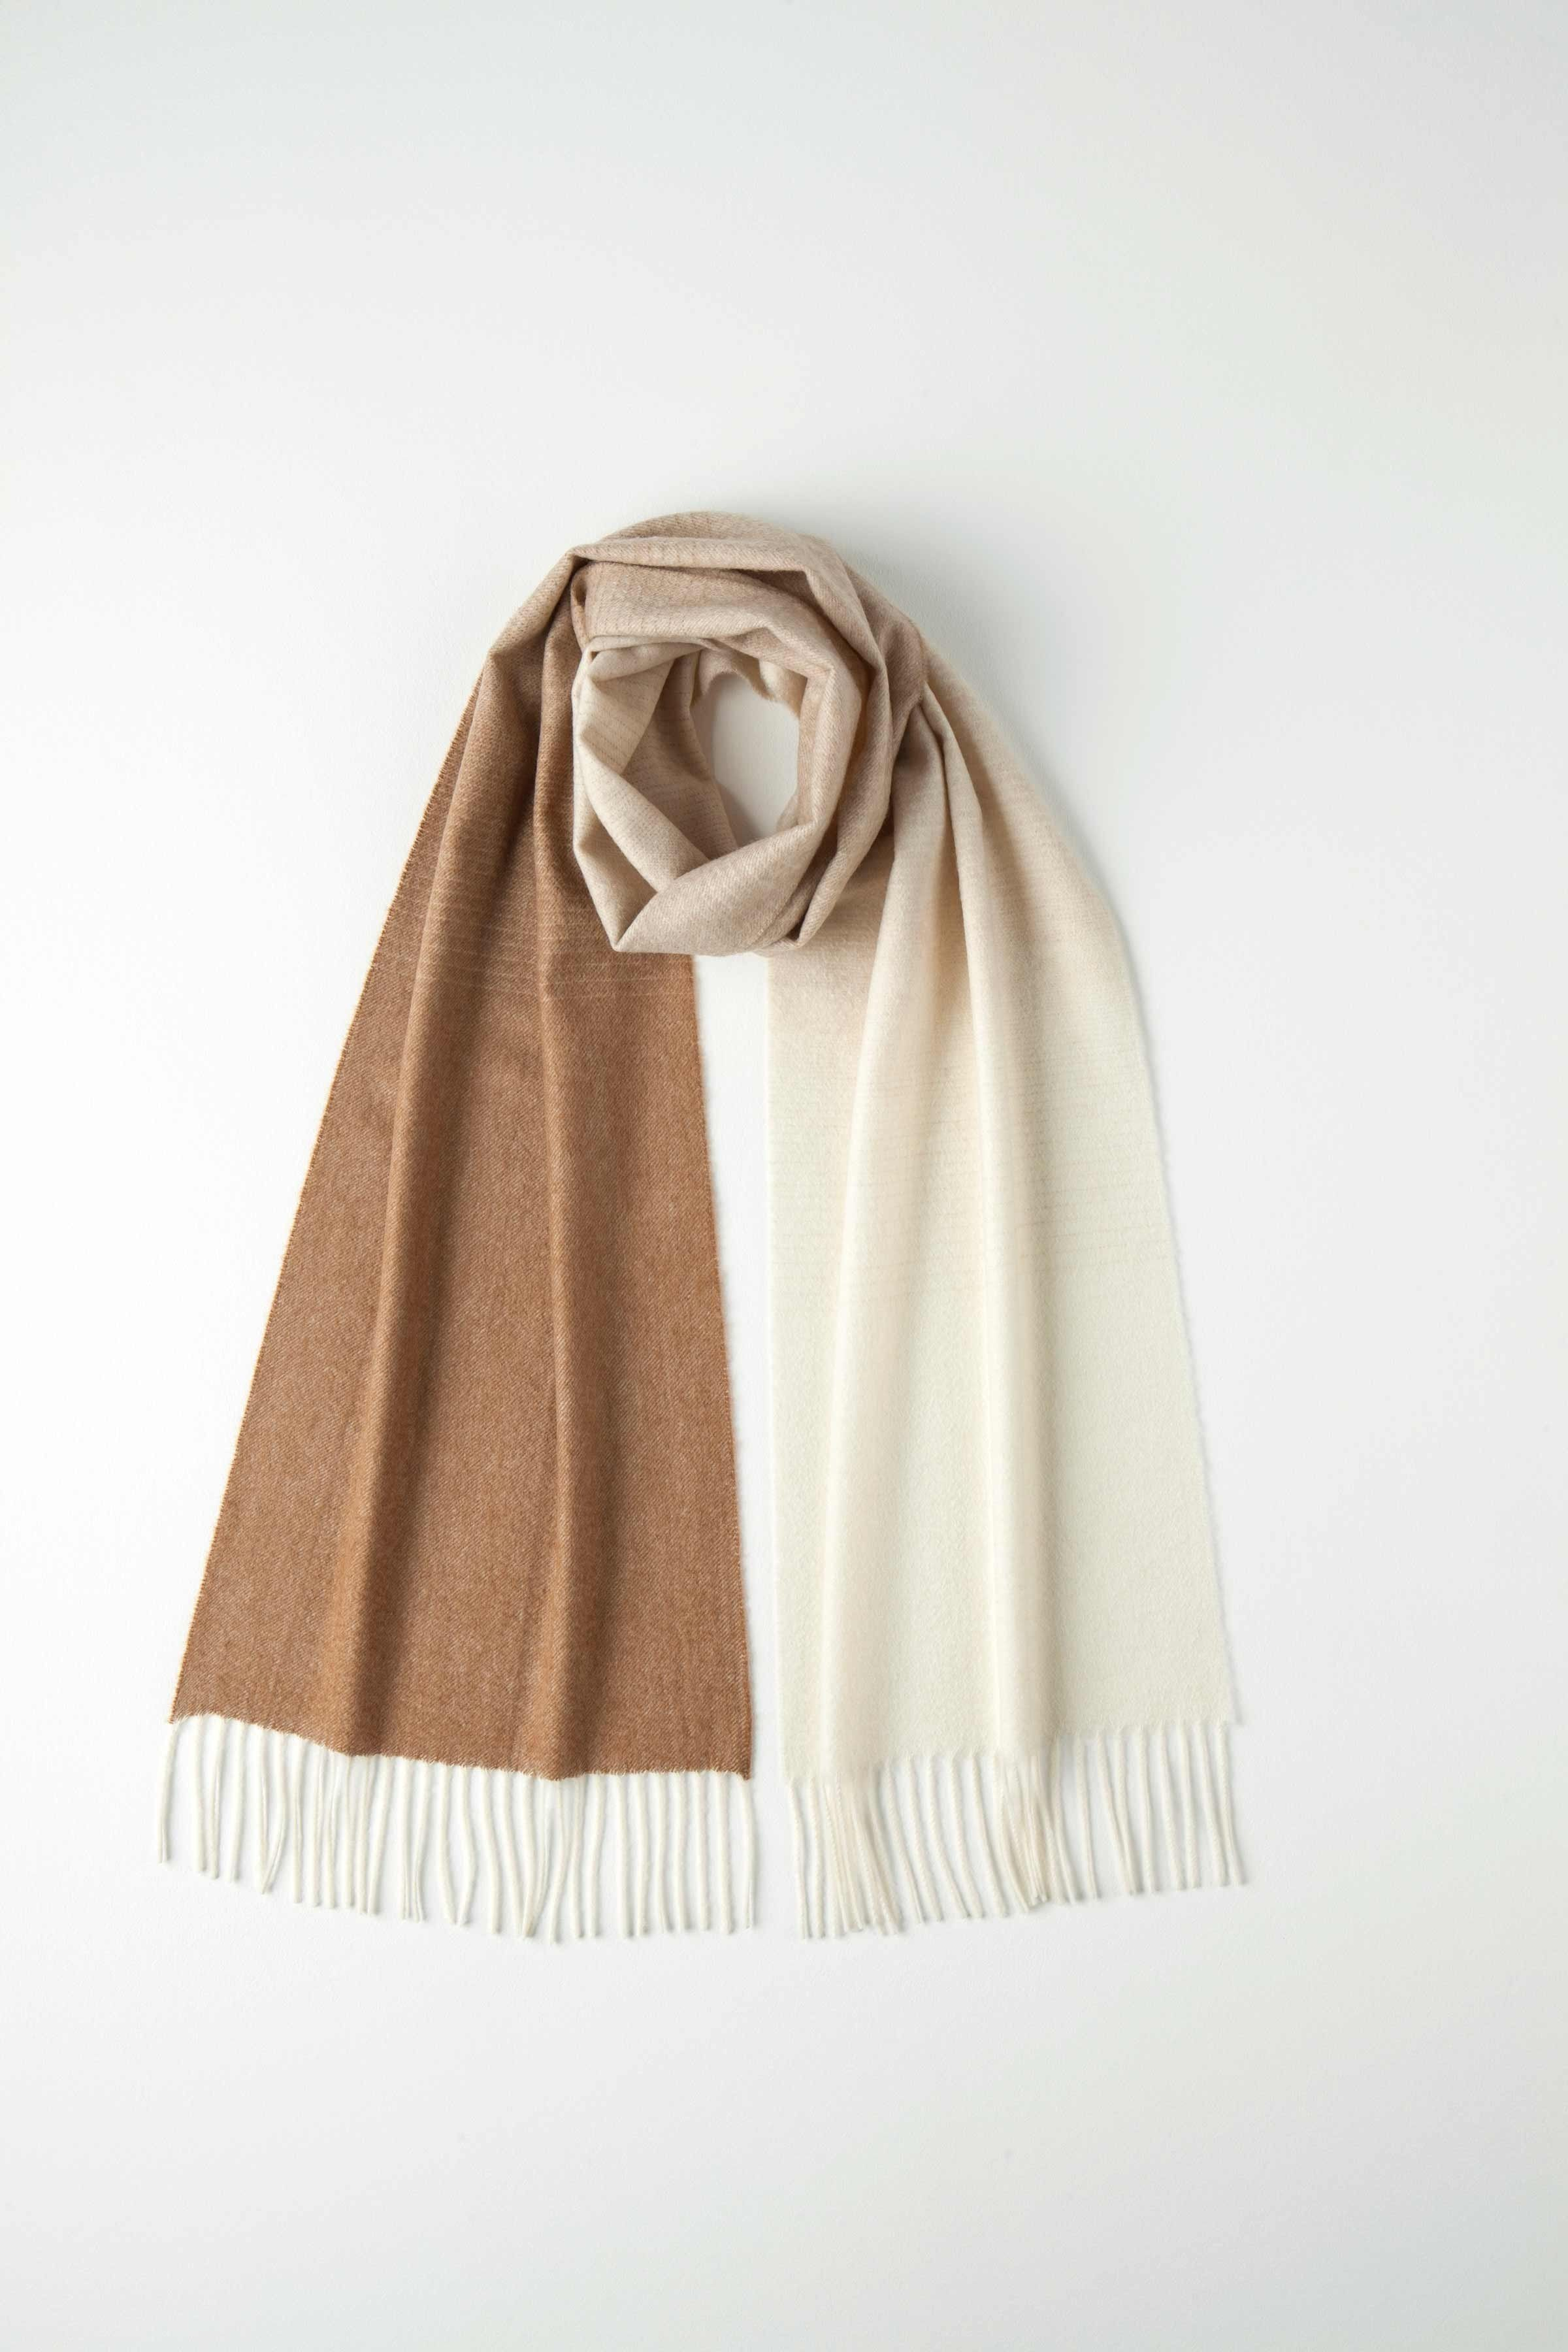 100/% Cashmere Winter Scarf Scarve Scotland Warm Herringbone Brown Shawl Neck NEW